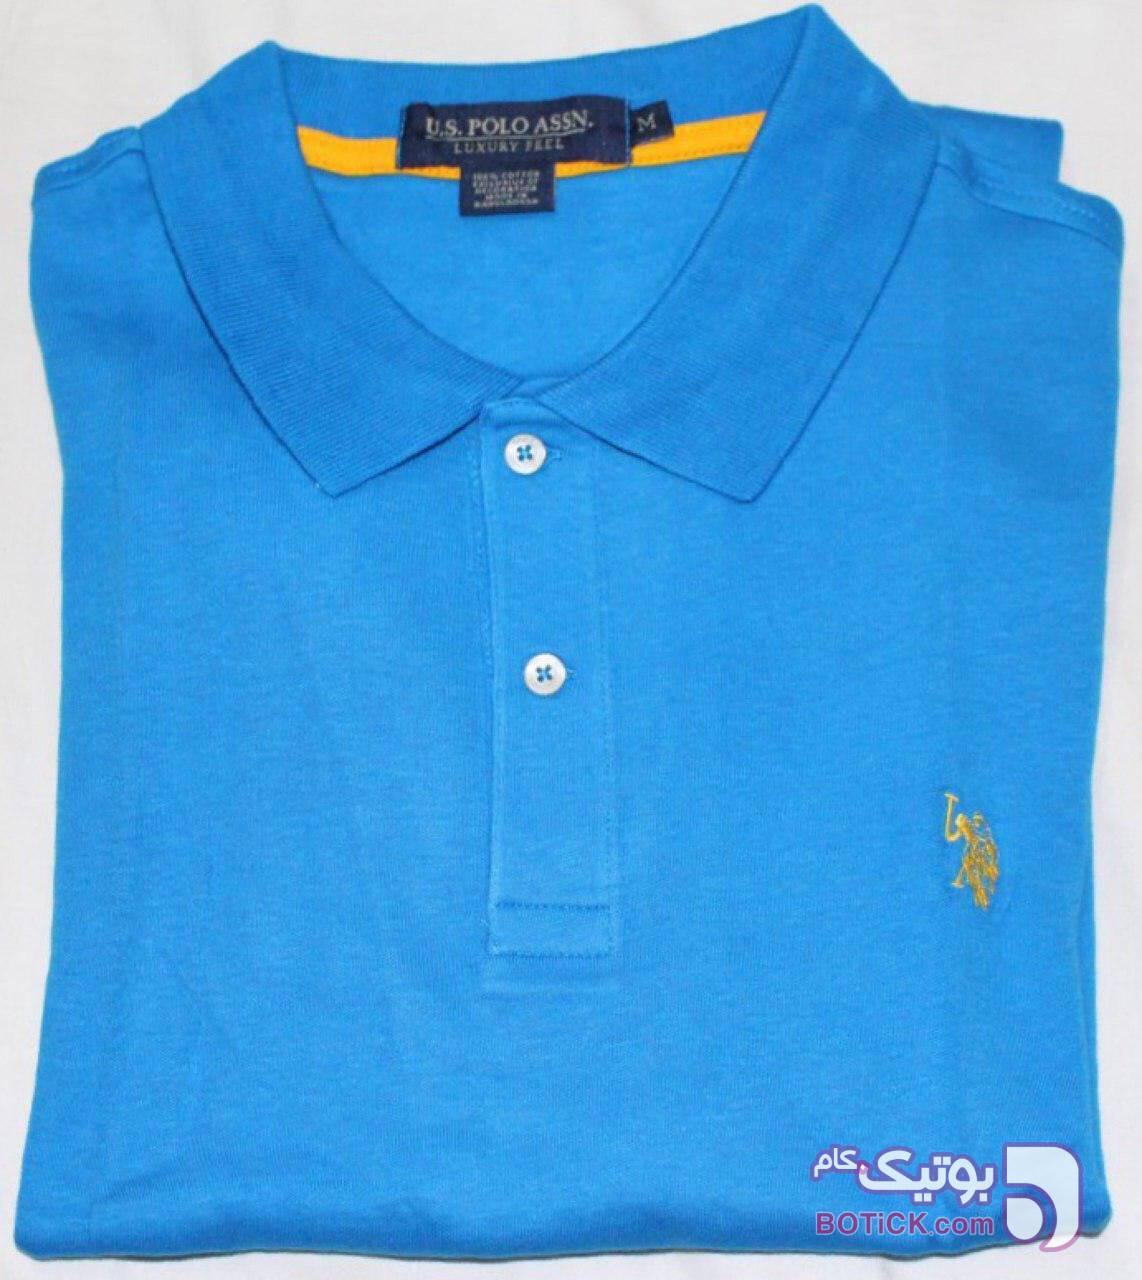 Polo آبی تی شرتو پولو شرت مردانه